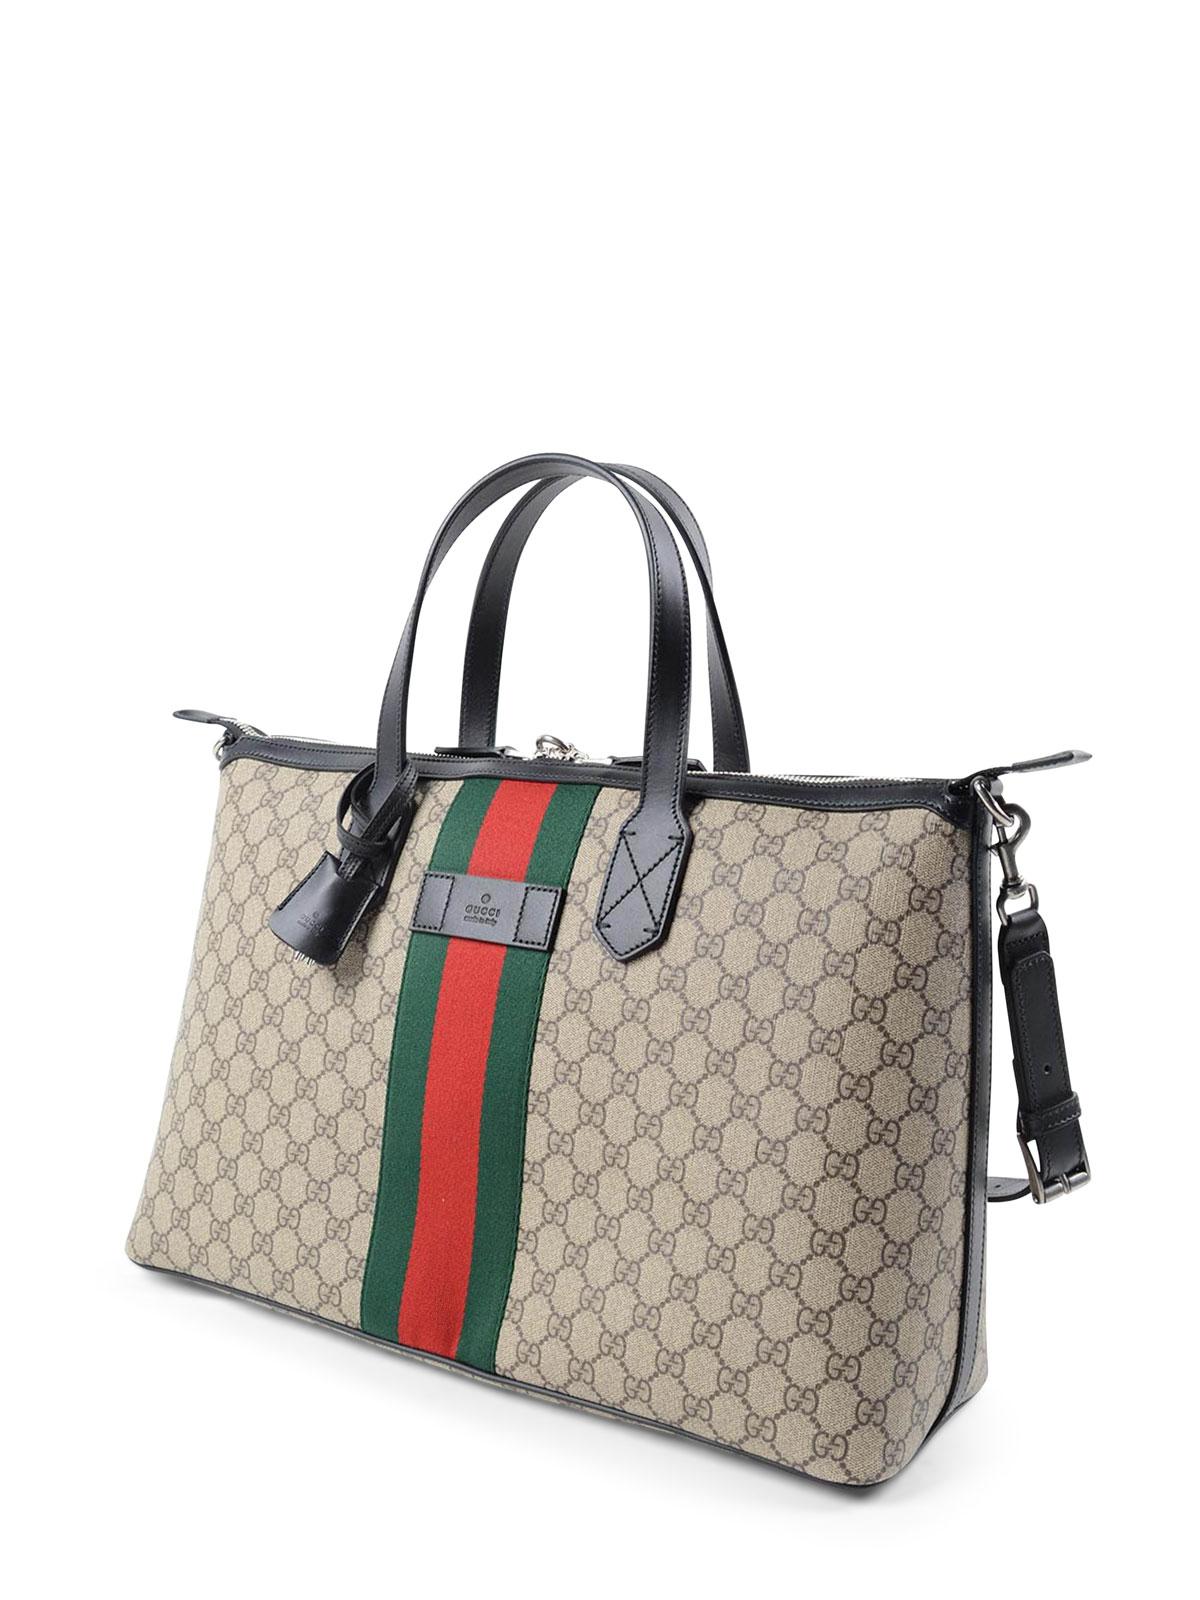 95a8e8168bdc GUCCI: Luggage & Travel bags online - GG Supreme canvas duffle bag